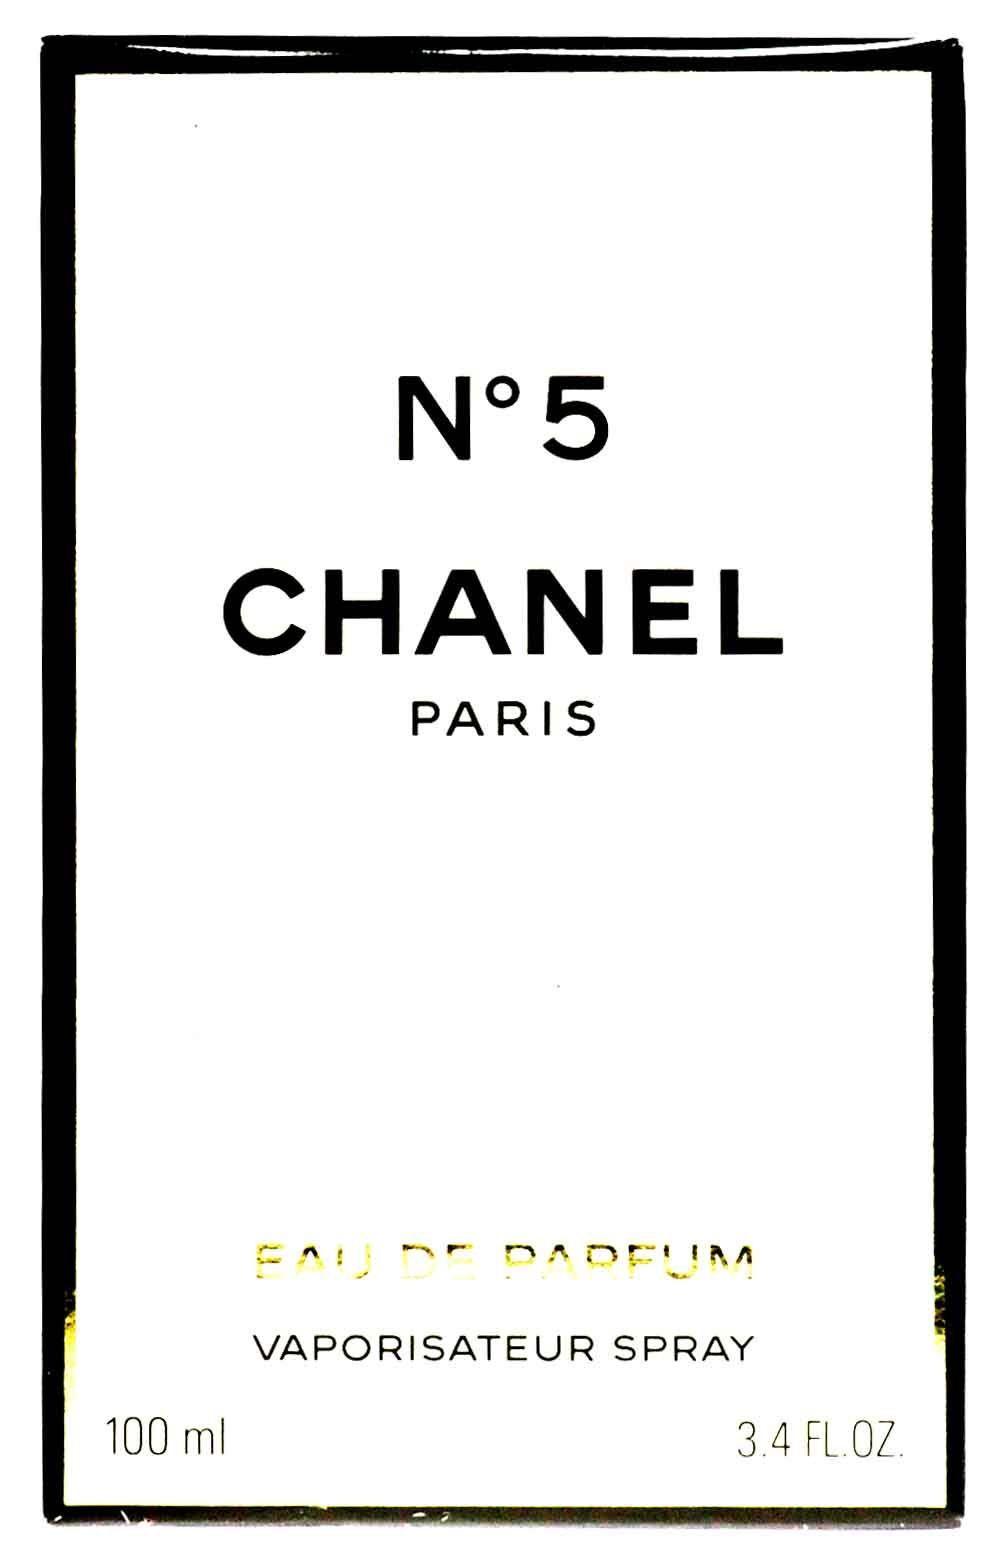 chanel n5 logo - Google Search | Identity | Pinterest ...